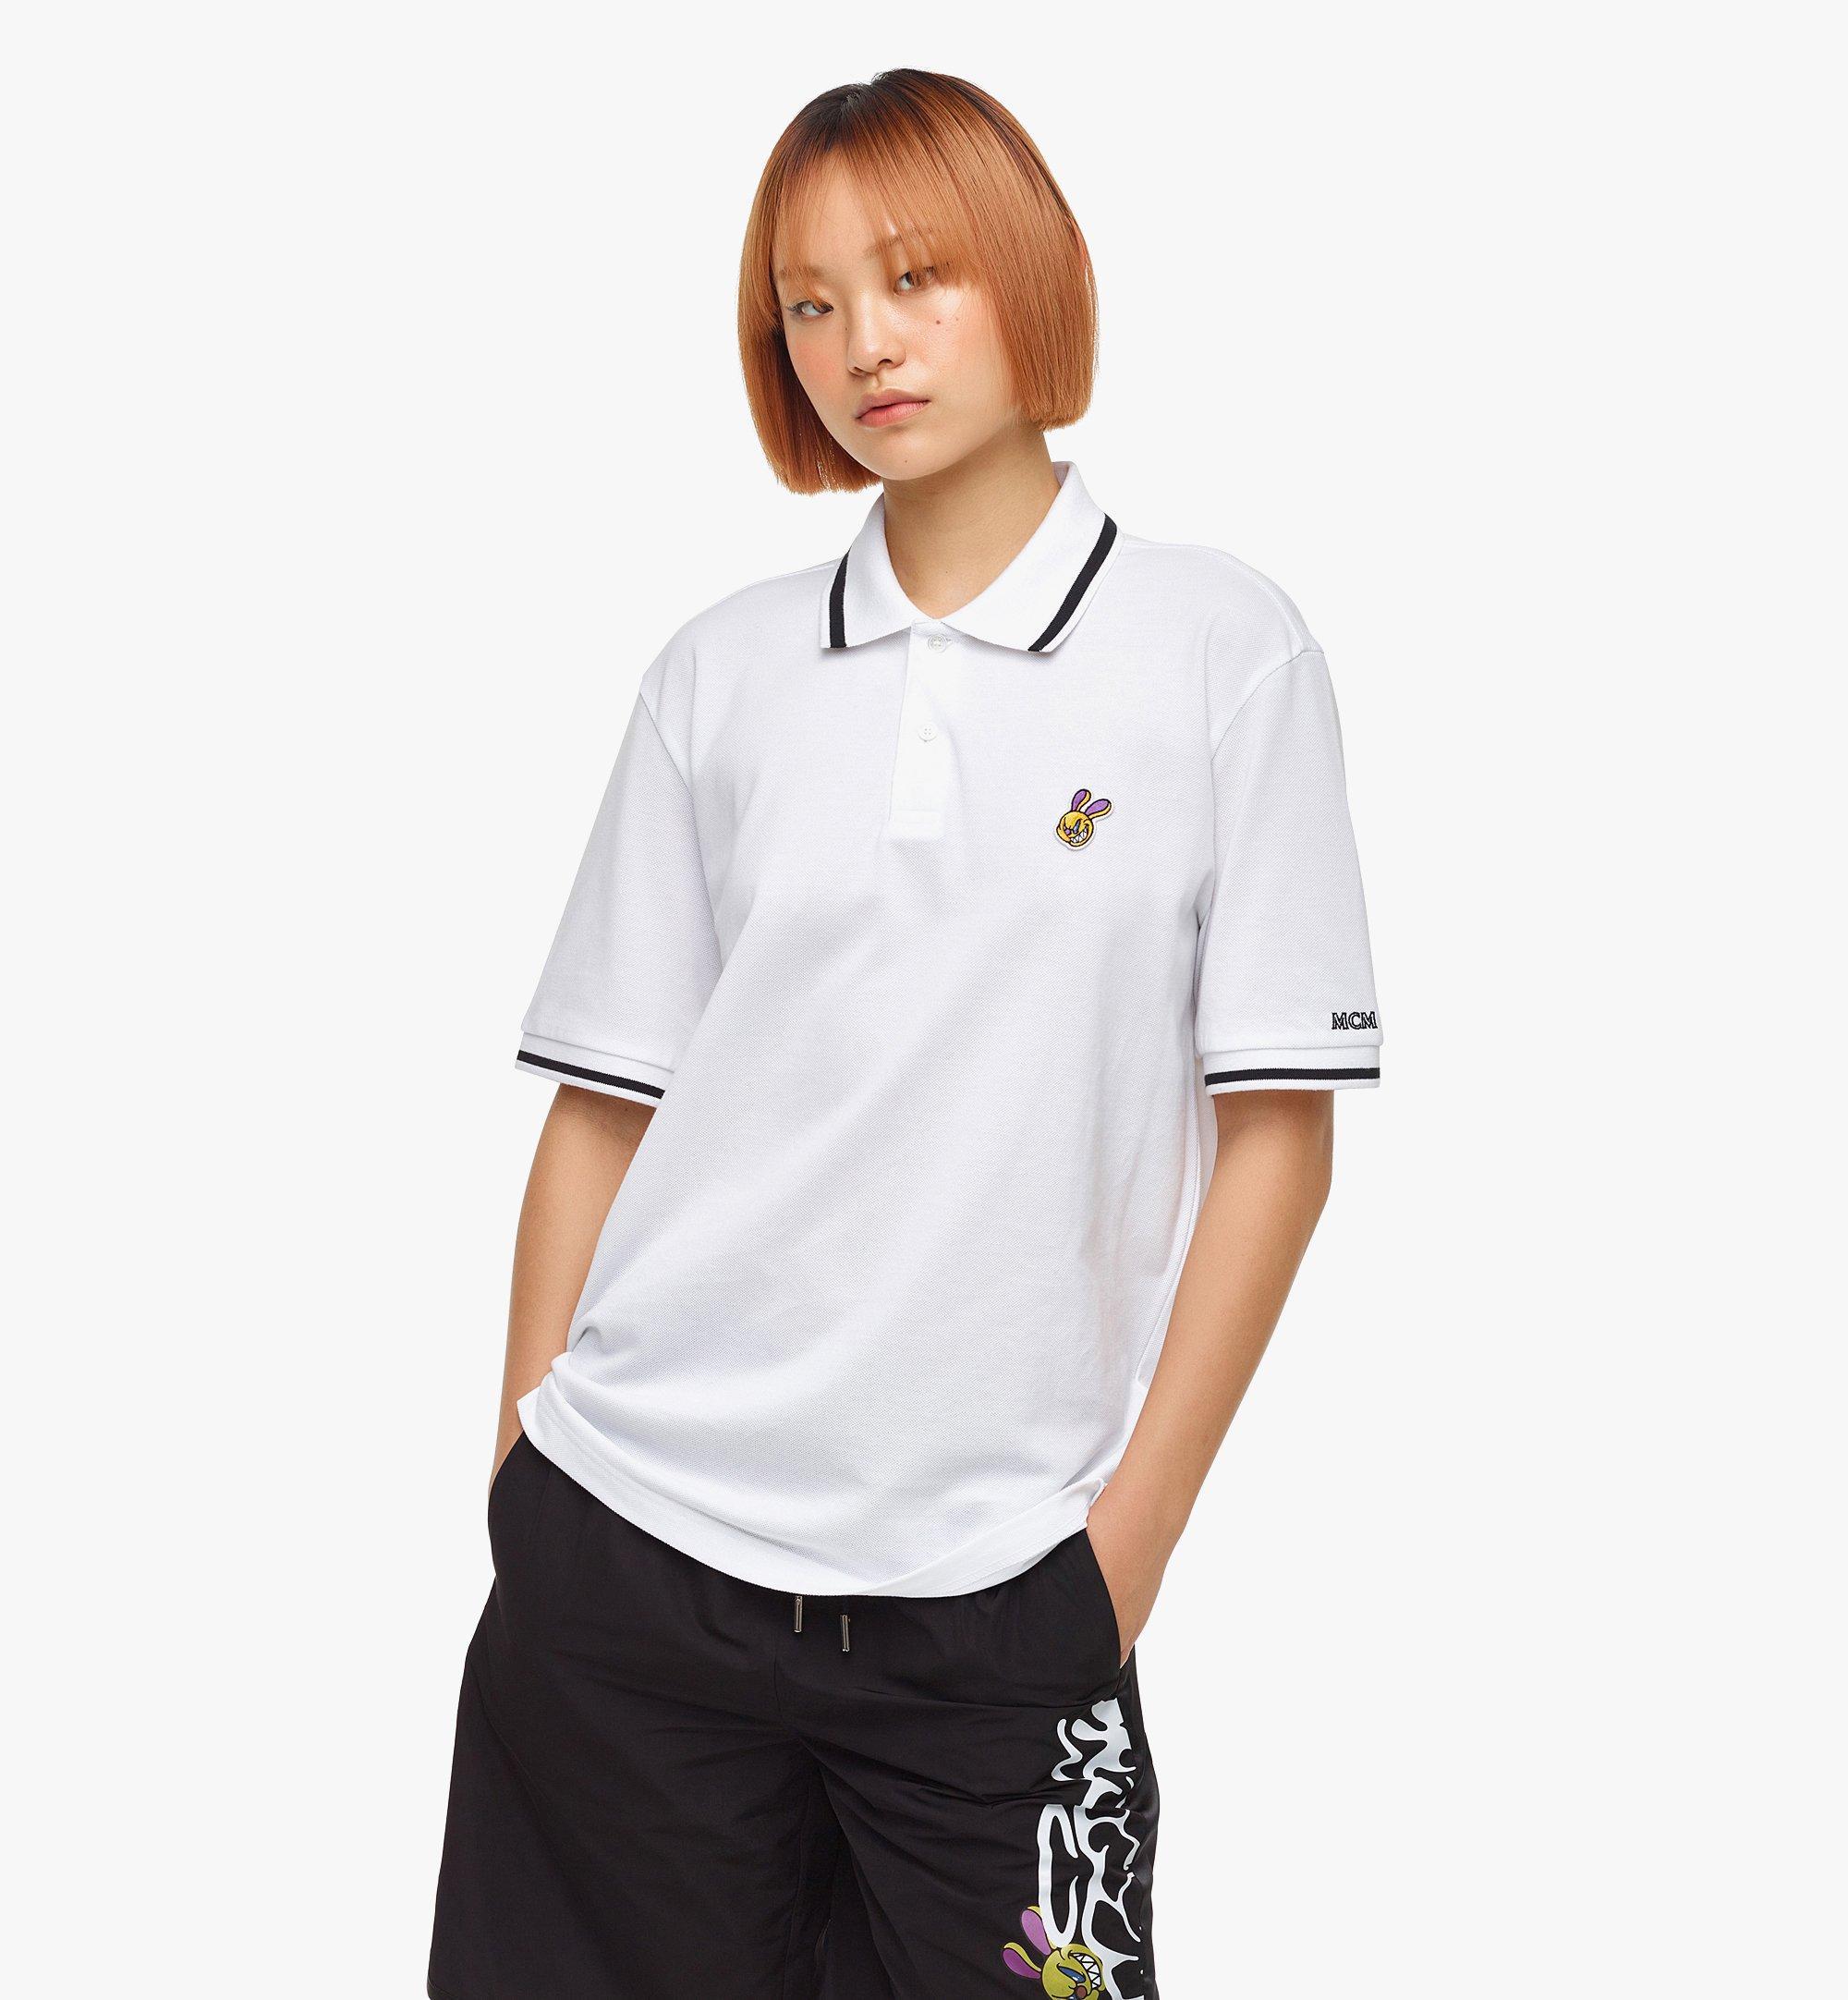 MCM เสื้อโปโล MCM x SAMBYPEN สำหรับผู้ชาย White MHTBASP01WT00L มุมมองอื่น 7